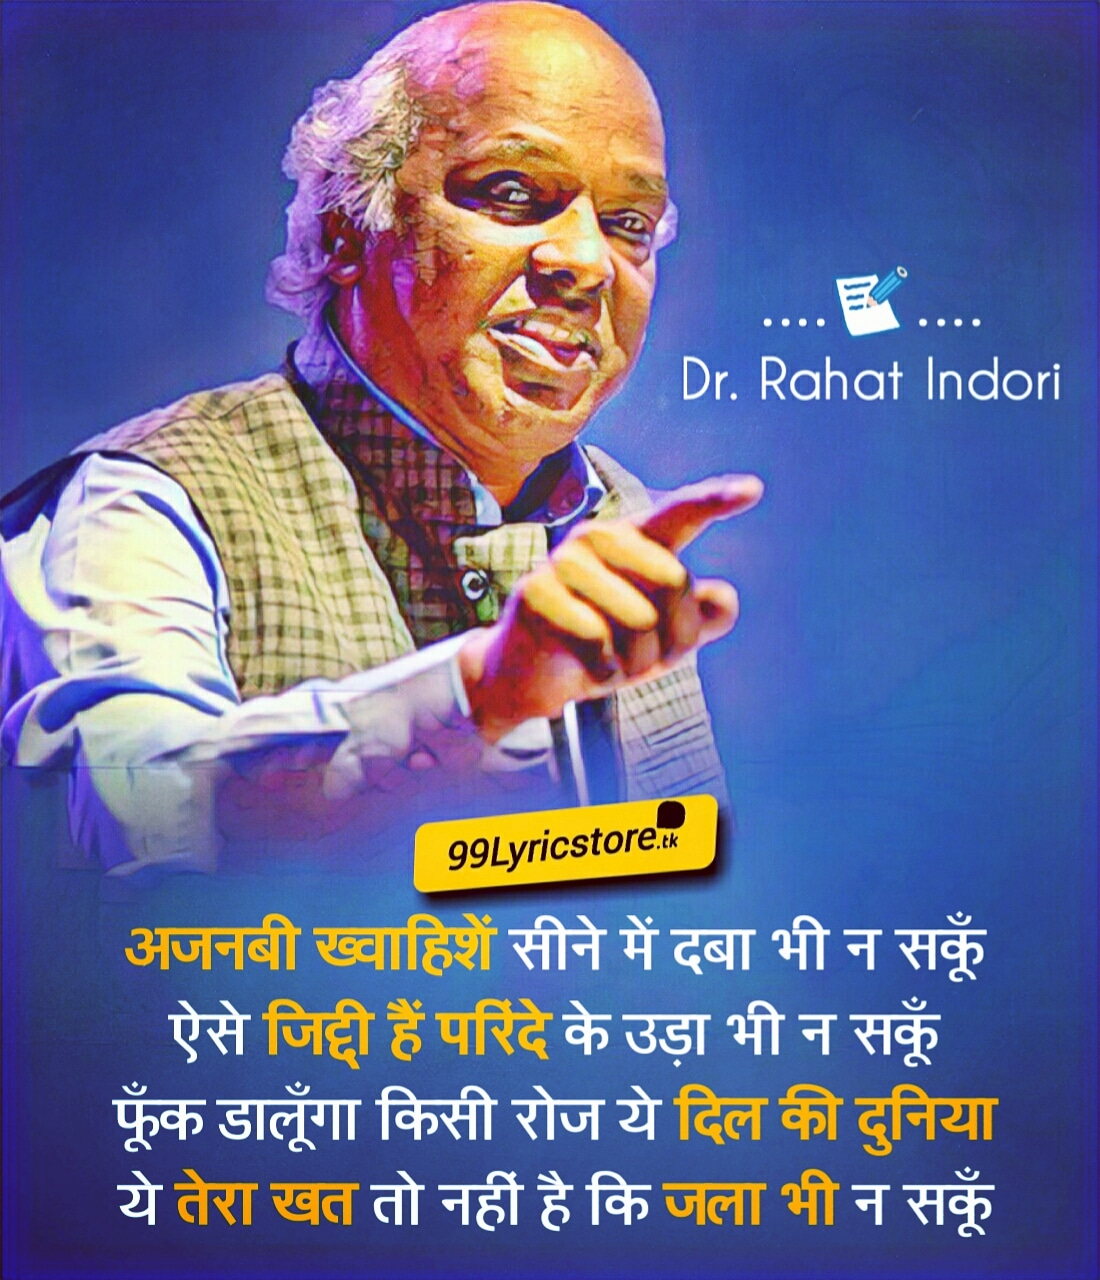 Ajnabi Khwaahishein Seene Me Daba Bhi Na Sakoon written and performed by Rahat Indori. This poetry is best Ghazal and Shayari of Rahat Indori.